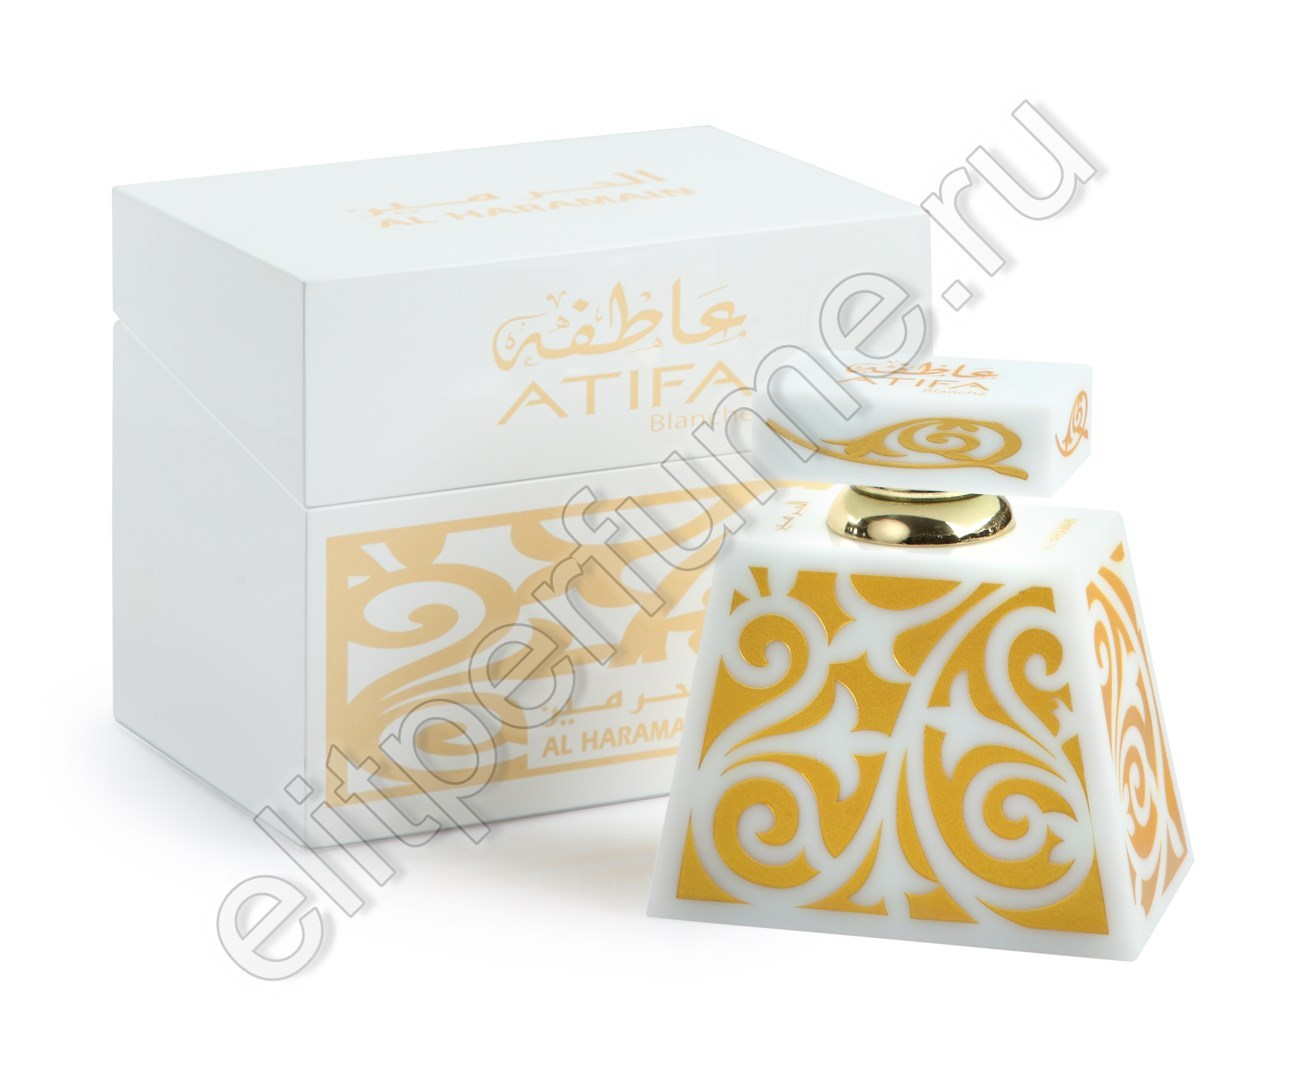 Атифа Бланш Atifa Blanche 24 мл арабские масляные духи от Аль Харамайн Al Haramain Perfumes